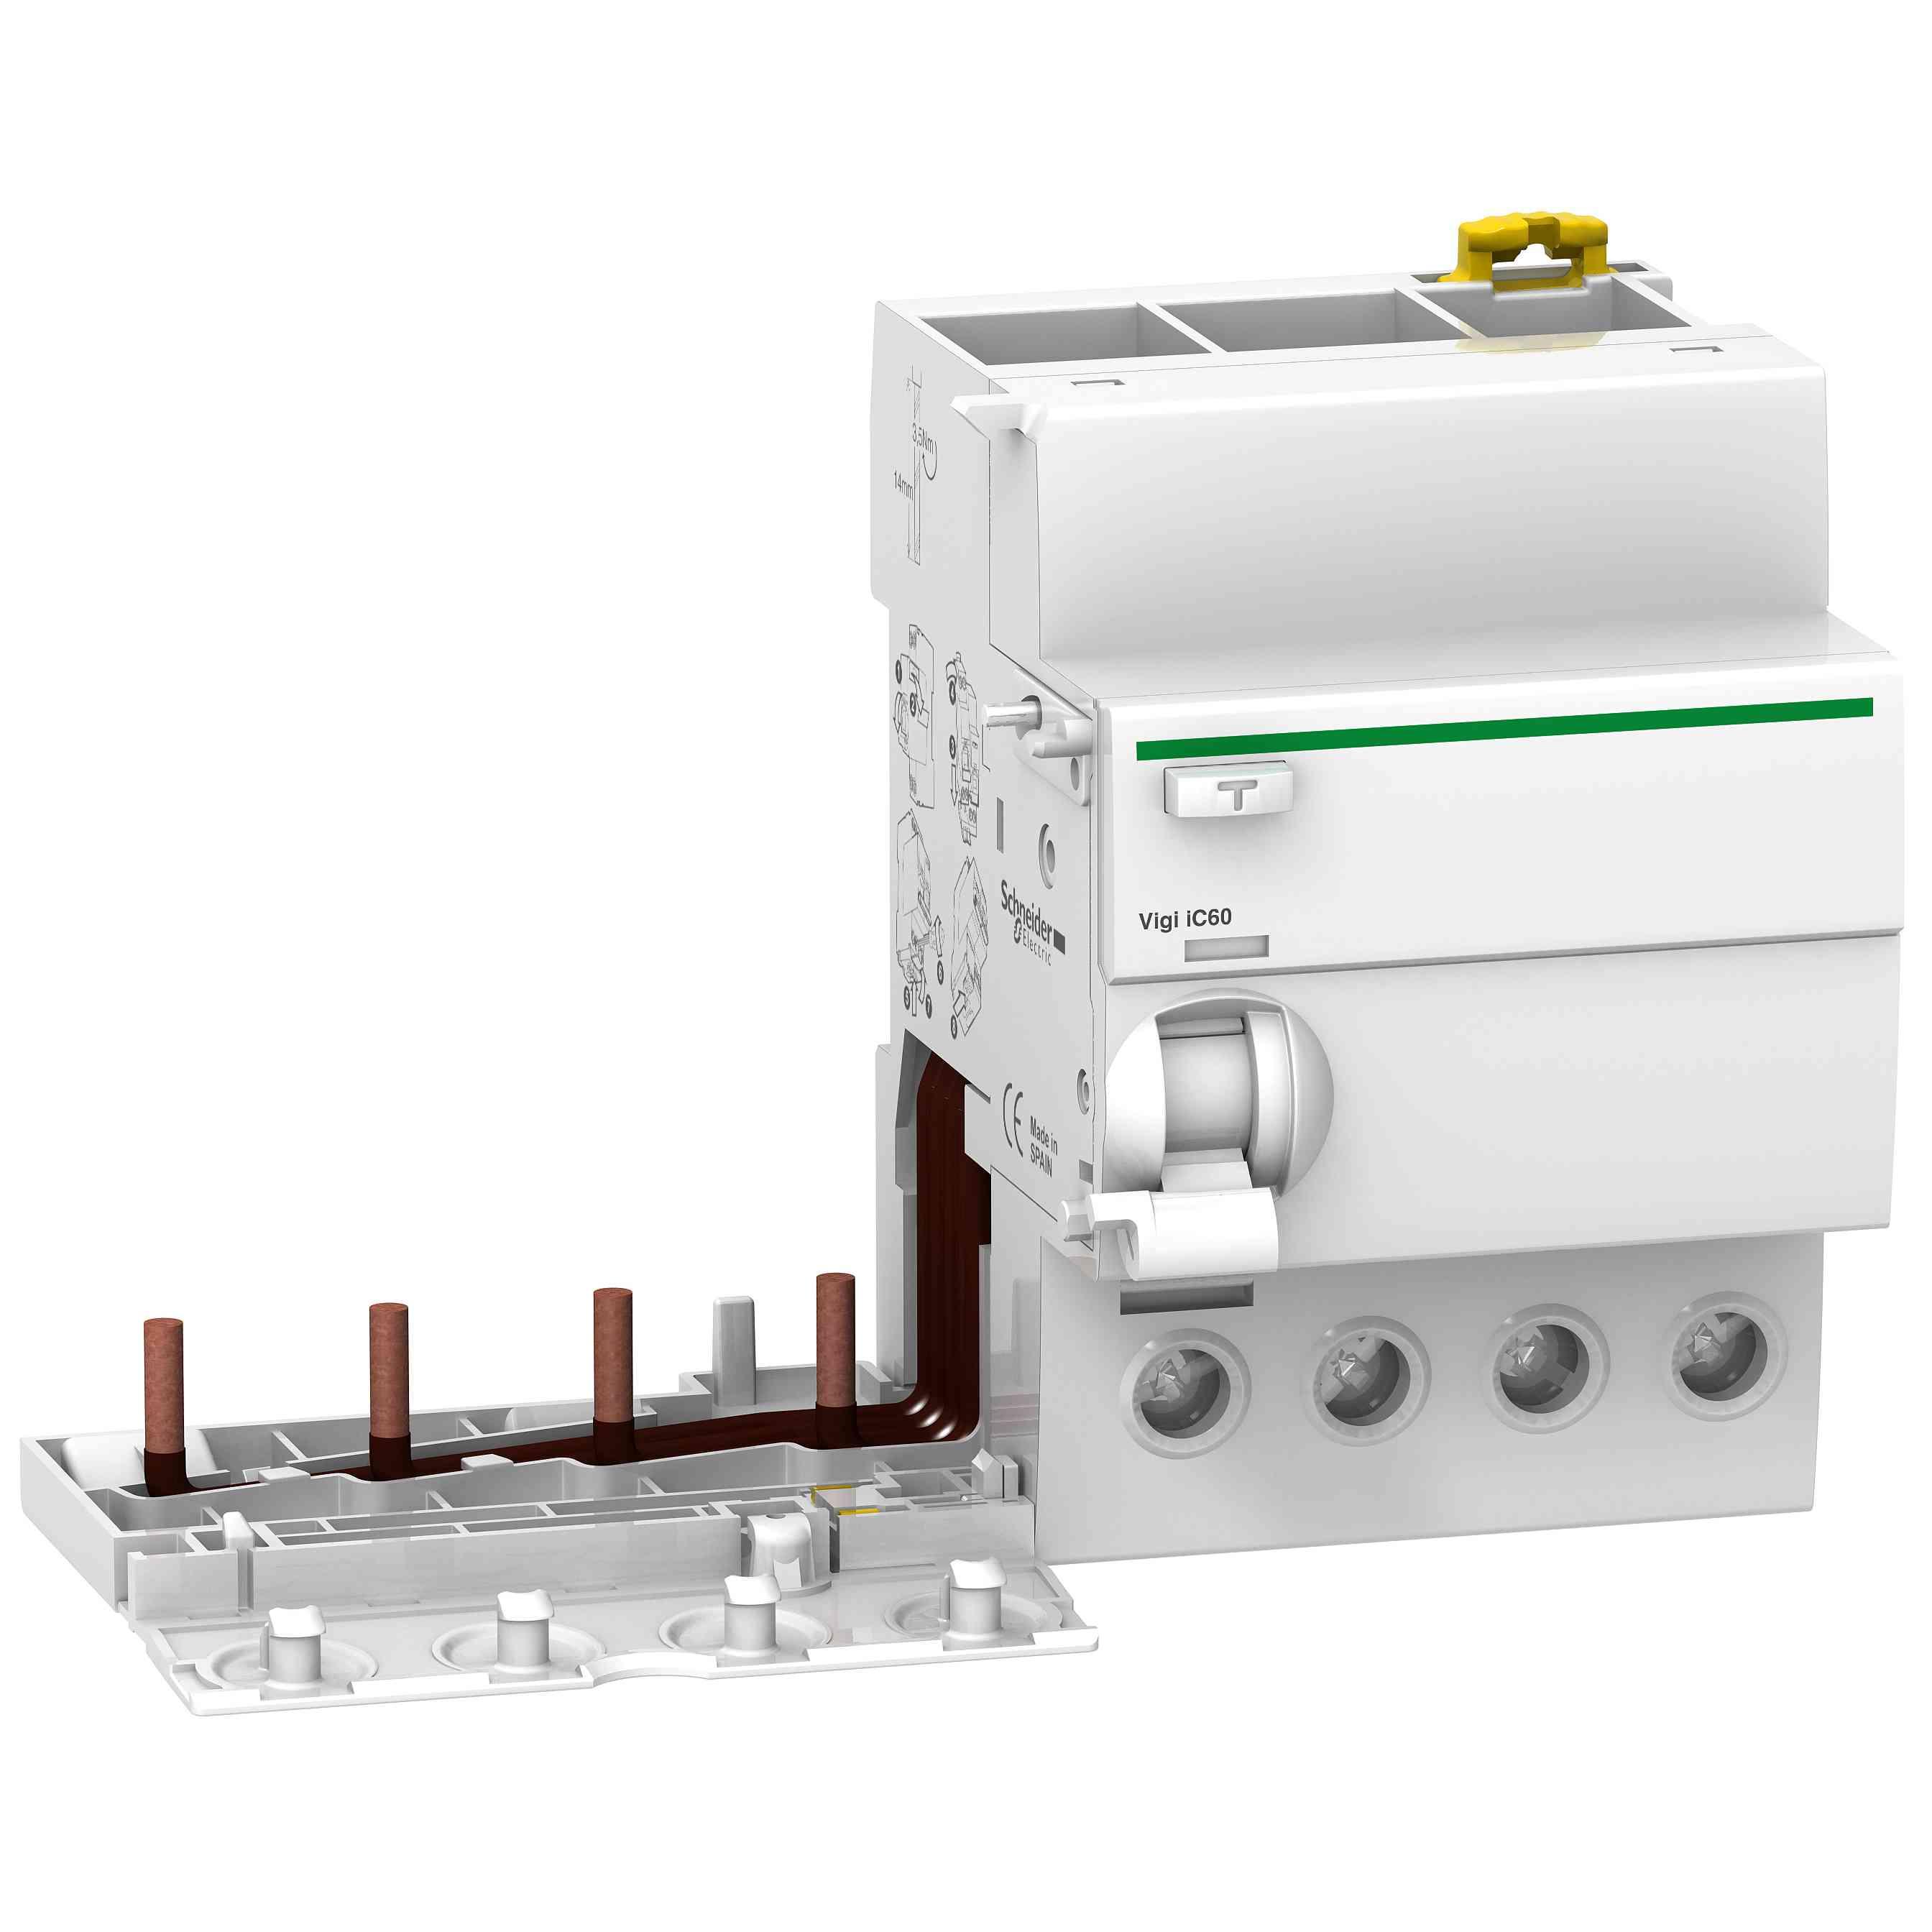 Vigi iC60 - ozemljitveni blok - 4P - 63 A - 300 mA - tip AC